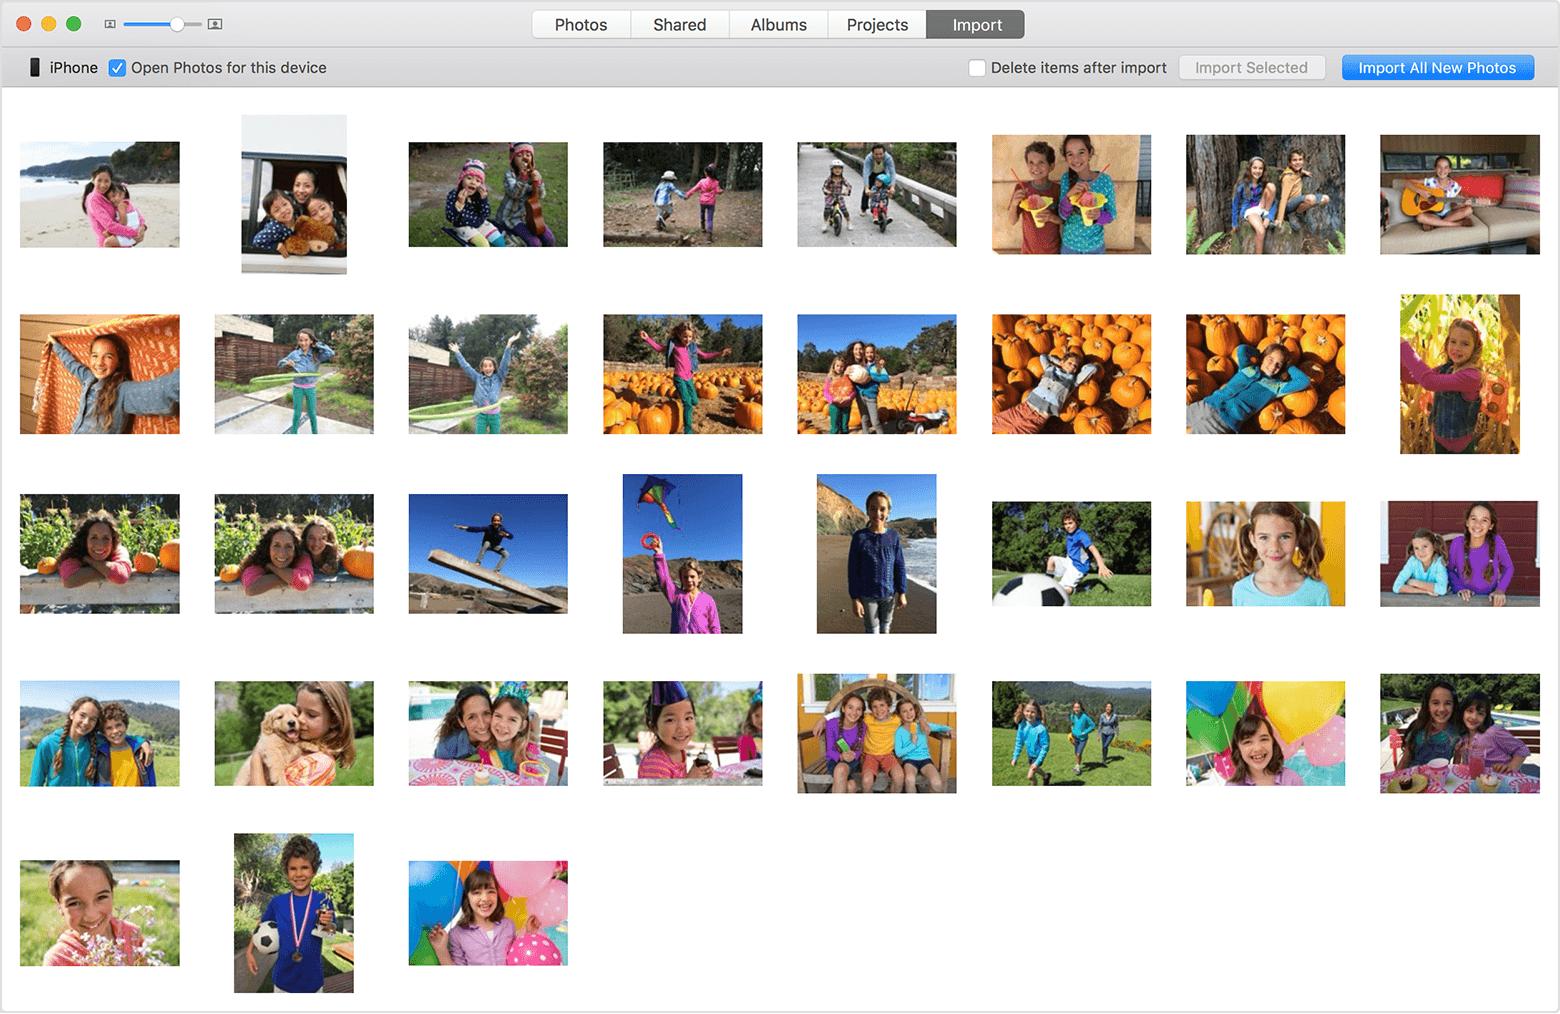 import iPhone photos to iPhoto's alternative